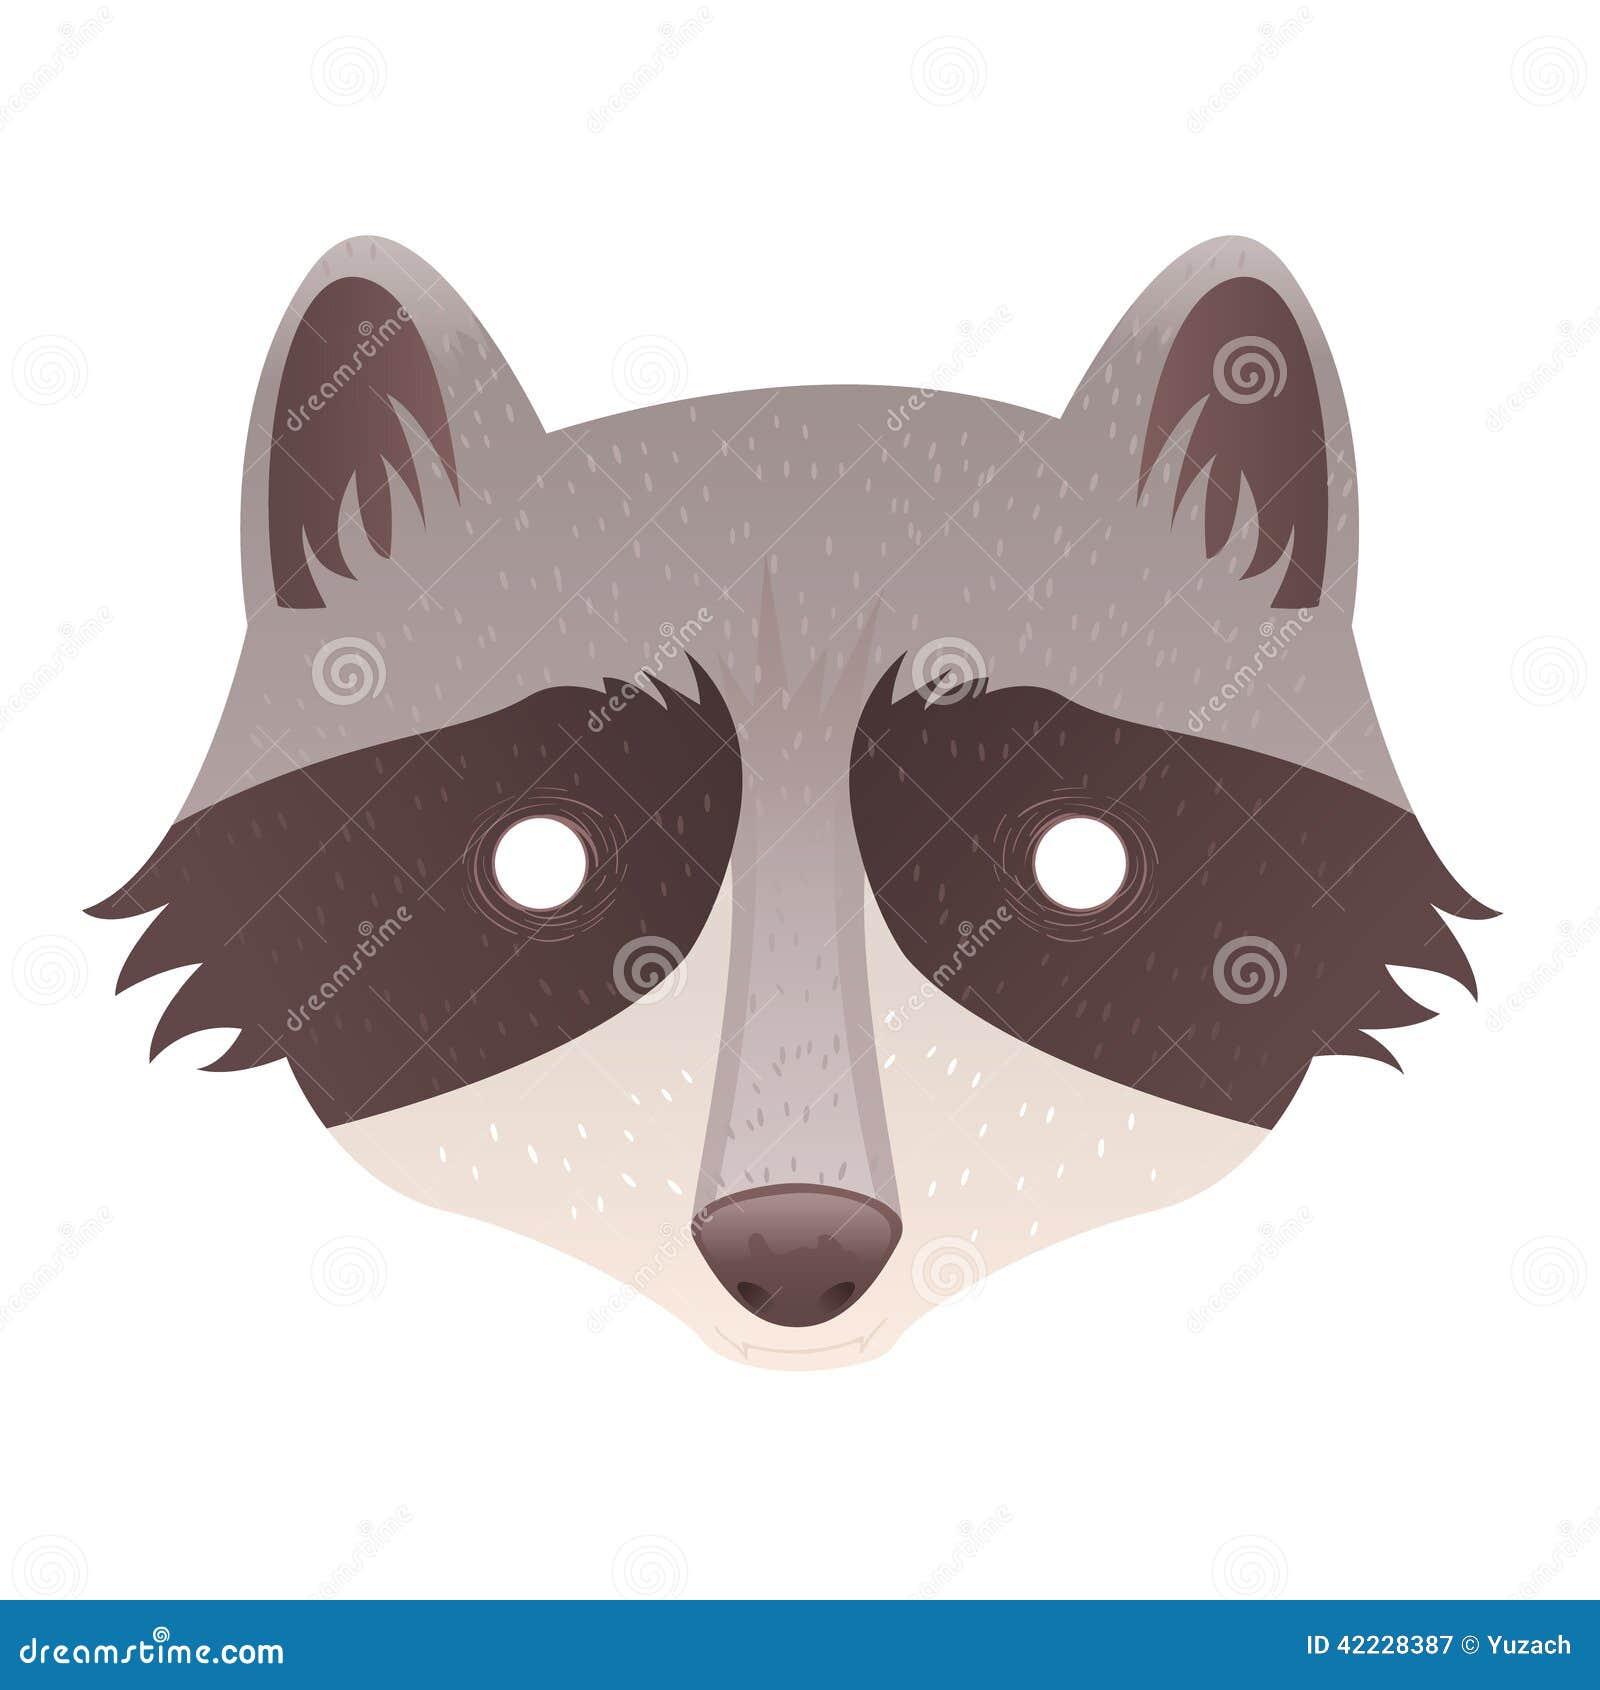 Cute Cartoon Raccoon Isolated Sticker Stock Vector - Image